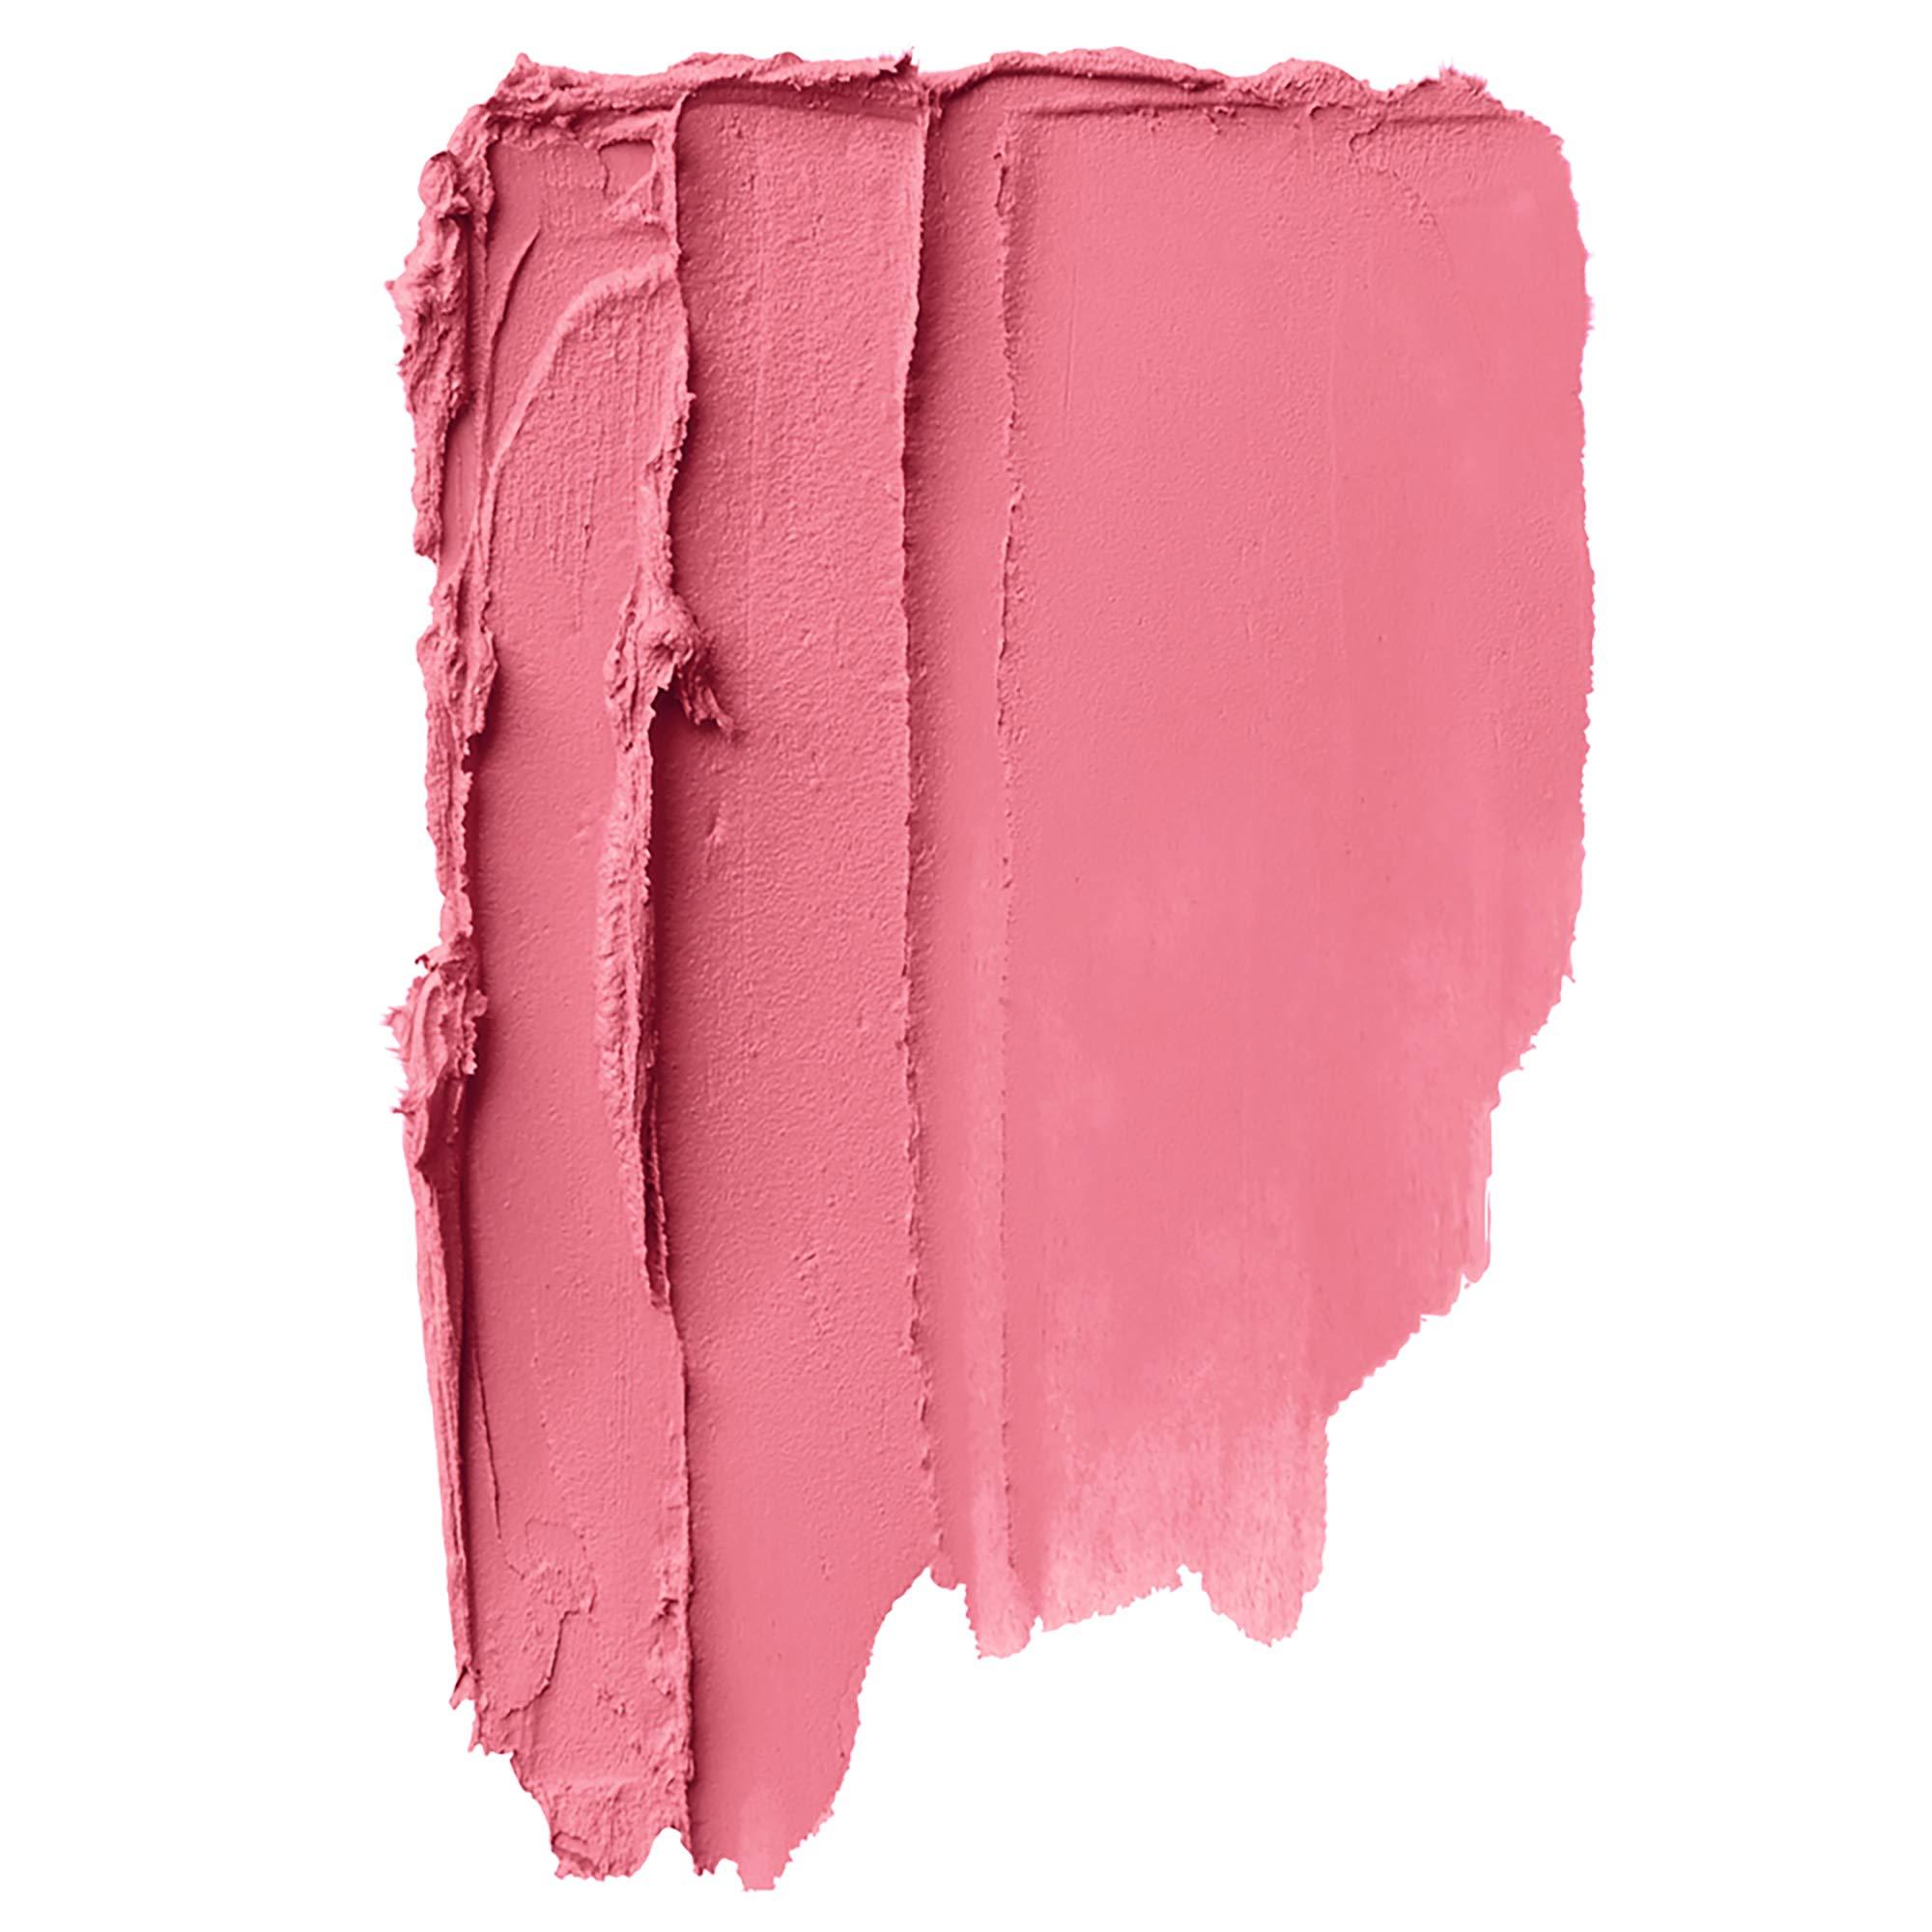 NYX PROFESSIONAL MAKEUP Matte Lipstick - Tea Rose (Mauve-Pink)